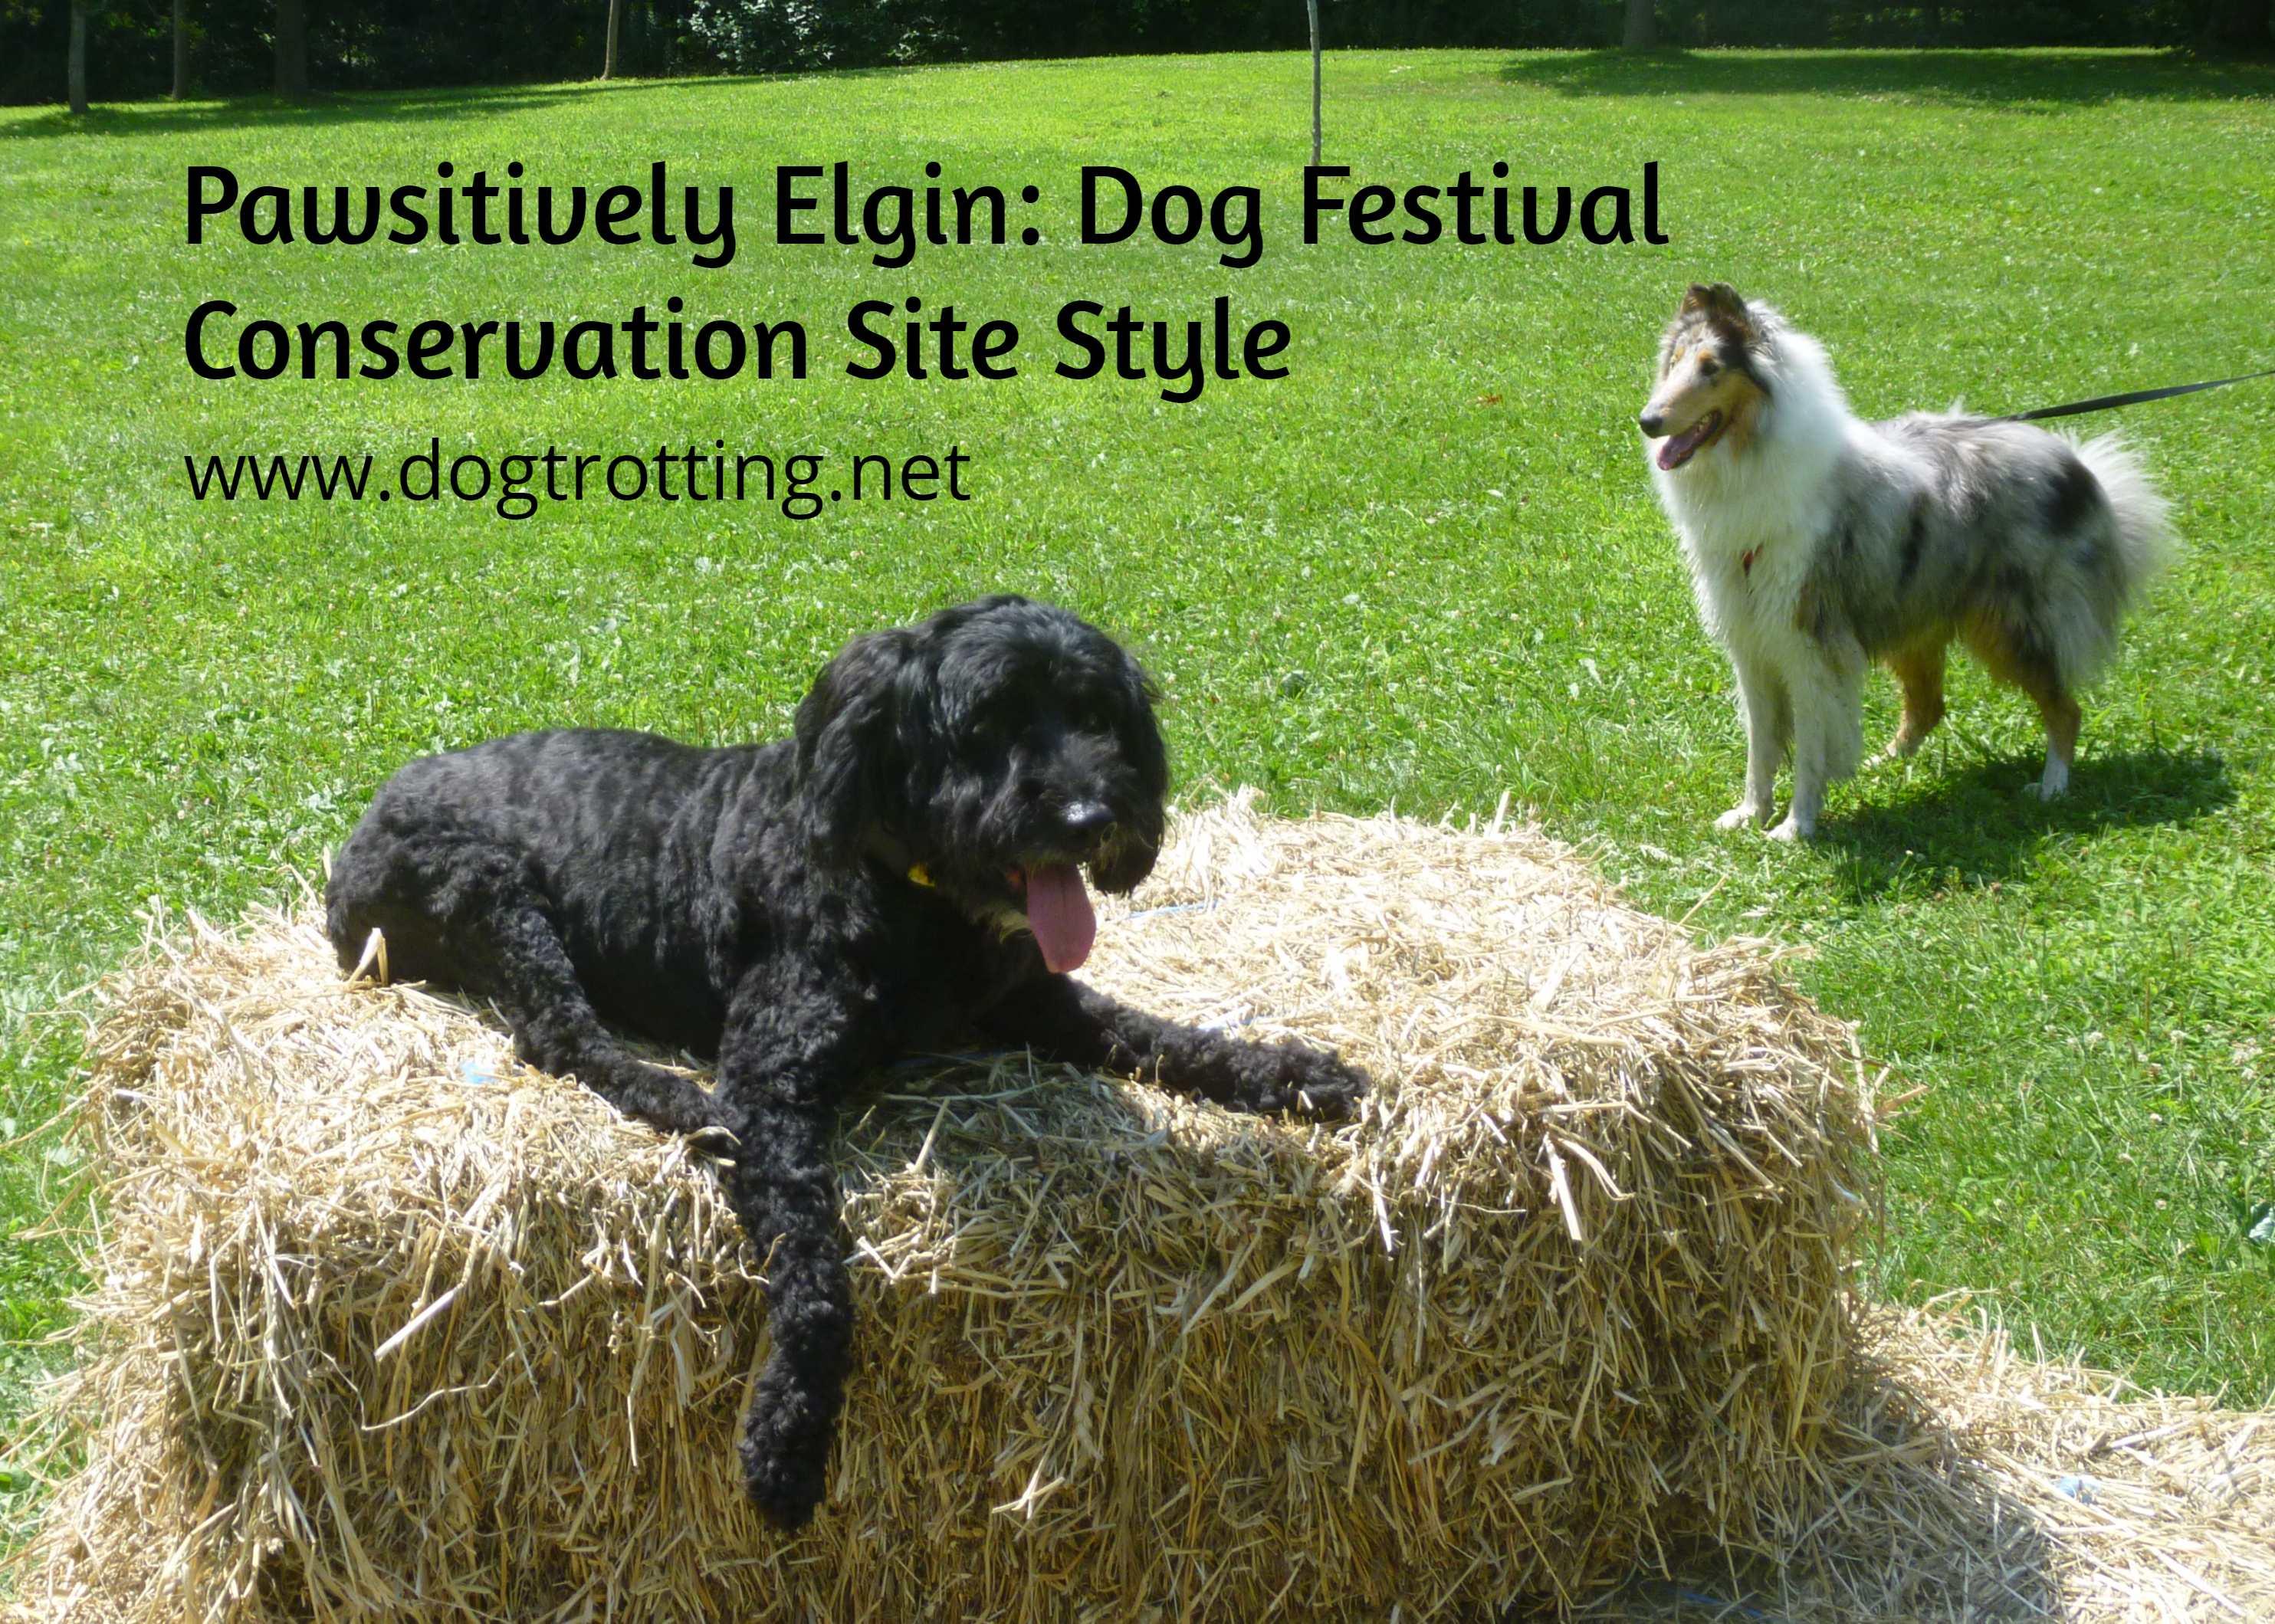 dog at Pawsitivily Elgin 2019